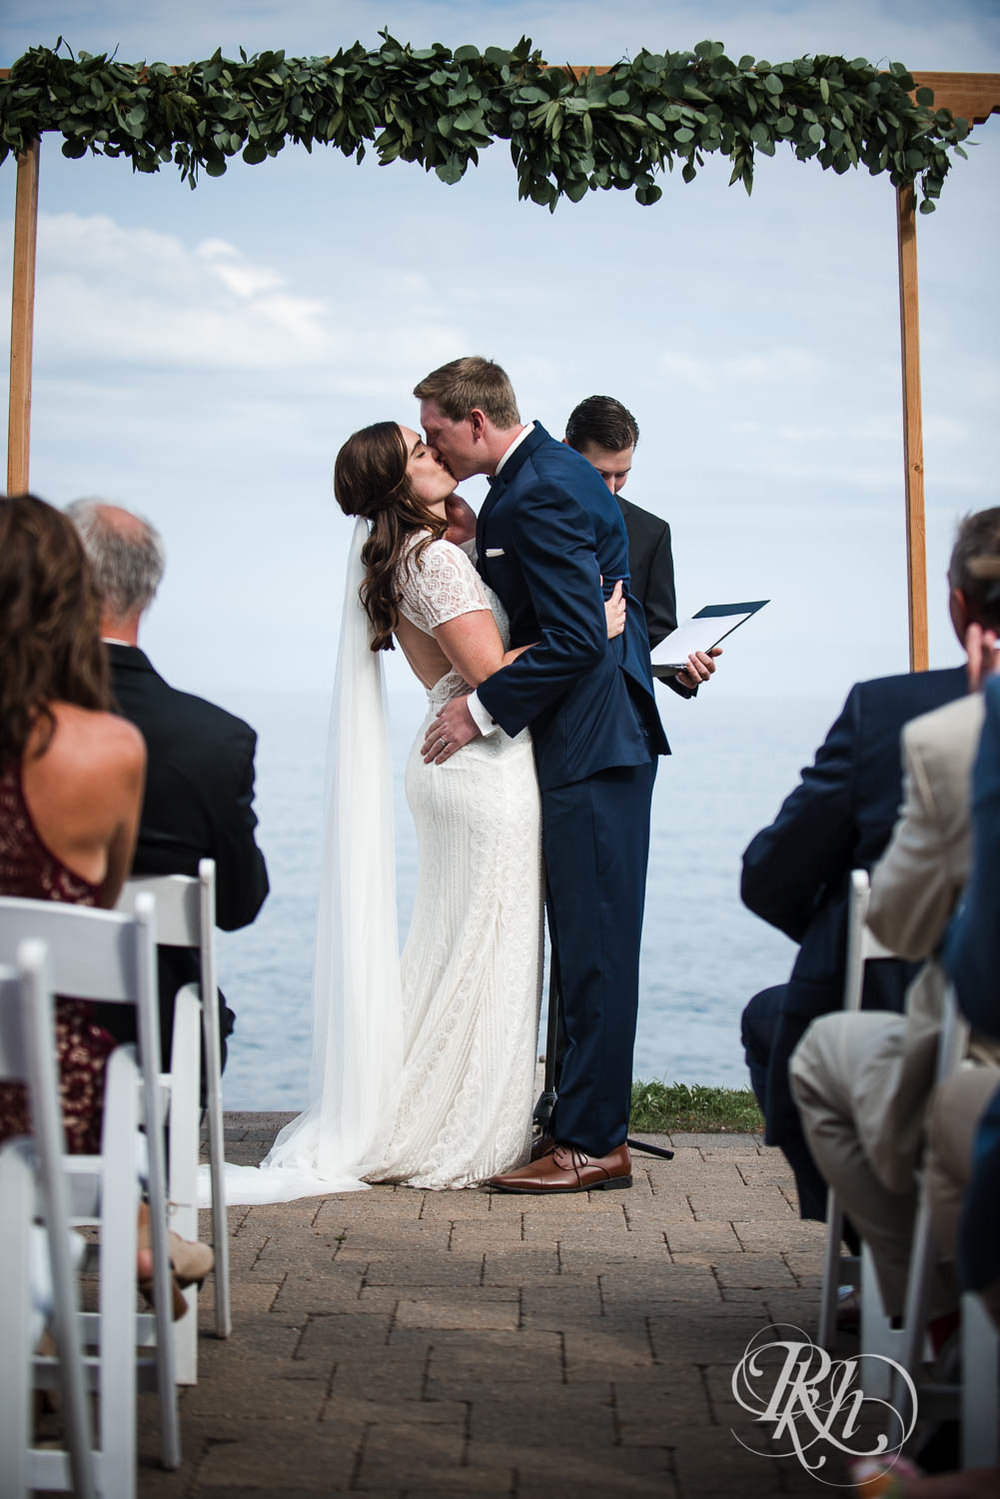 Kayla & John - Minnesota Wedding Photography - North Shore Wedding Photography - Bluefin Bay - RKH Images   (21 of 55).jpg